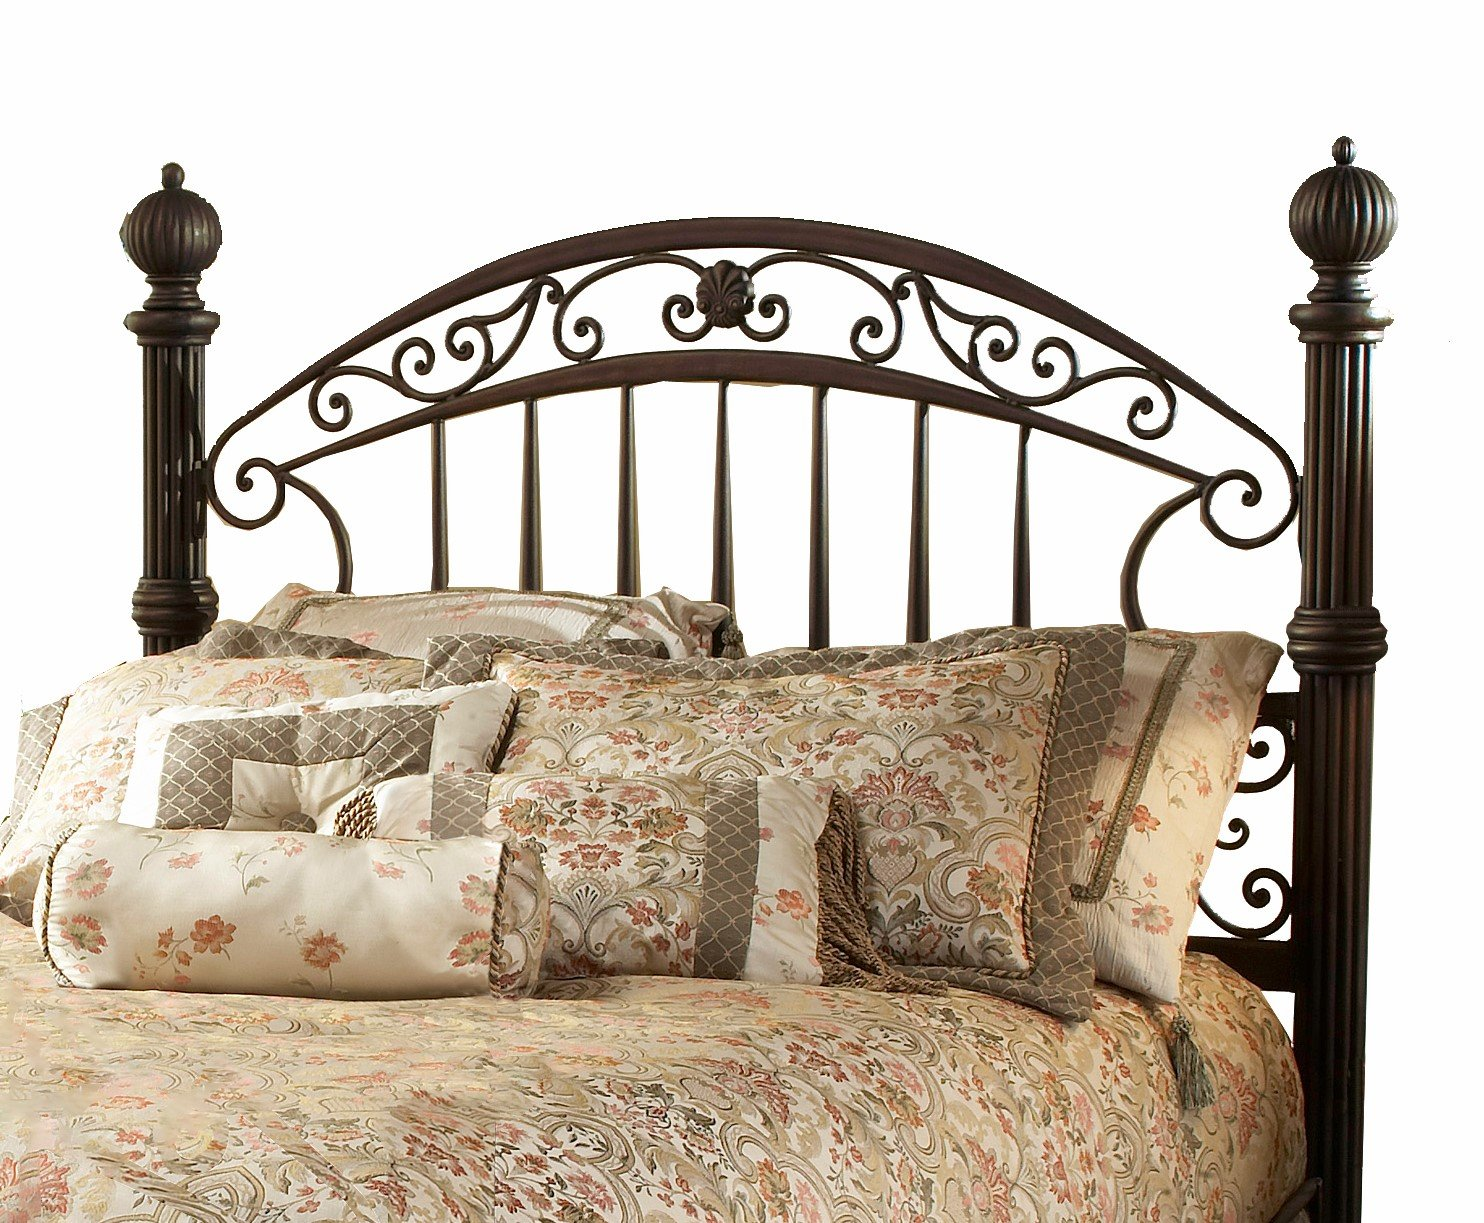 Hillsdale Furniture Chesapeake Headboard, King, Rustic Old Brown